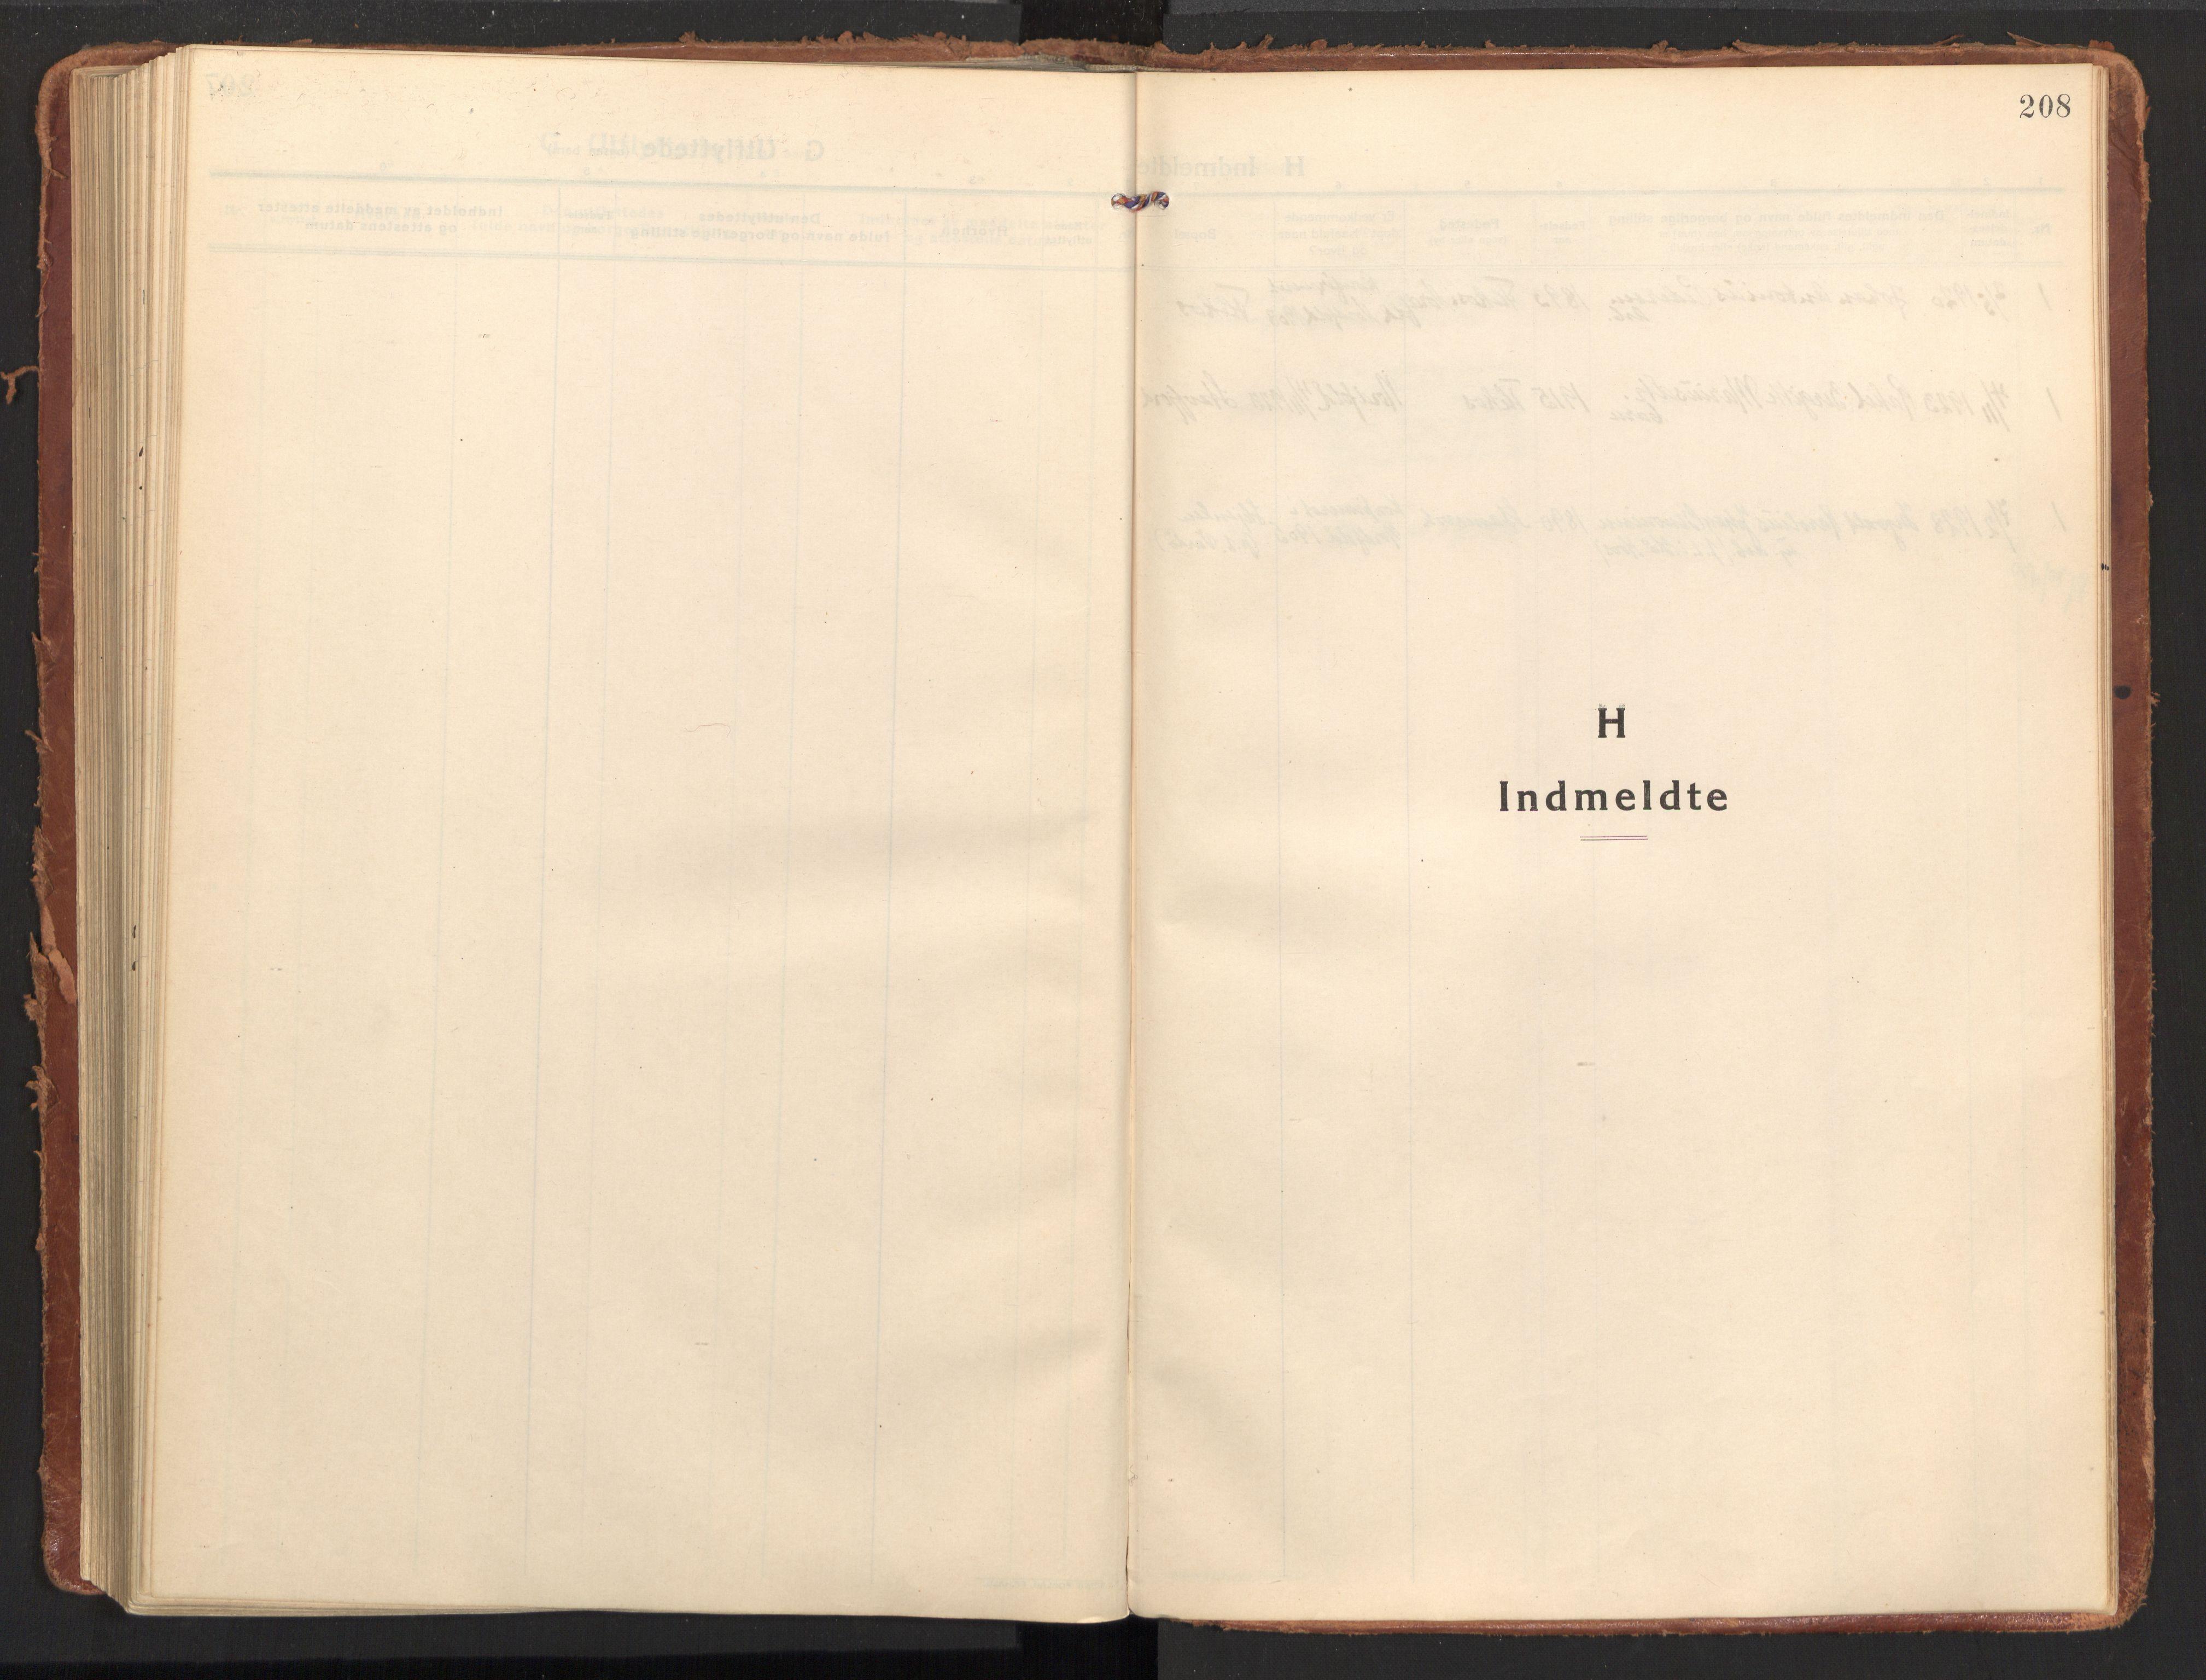 SAT, Ministerialprotokoller, klokkerbøker og fødselsregistre - Nordland, 858/L0833: Ministerialbok nr. 858A03, 1916-1934, s. 208